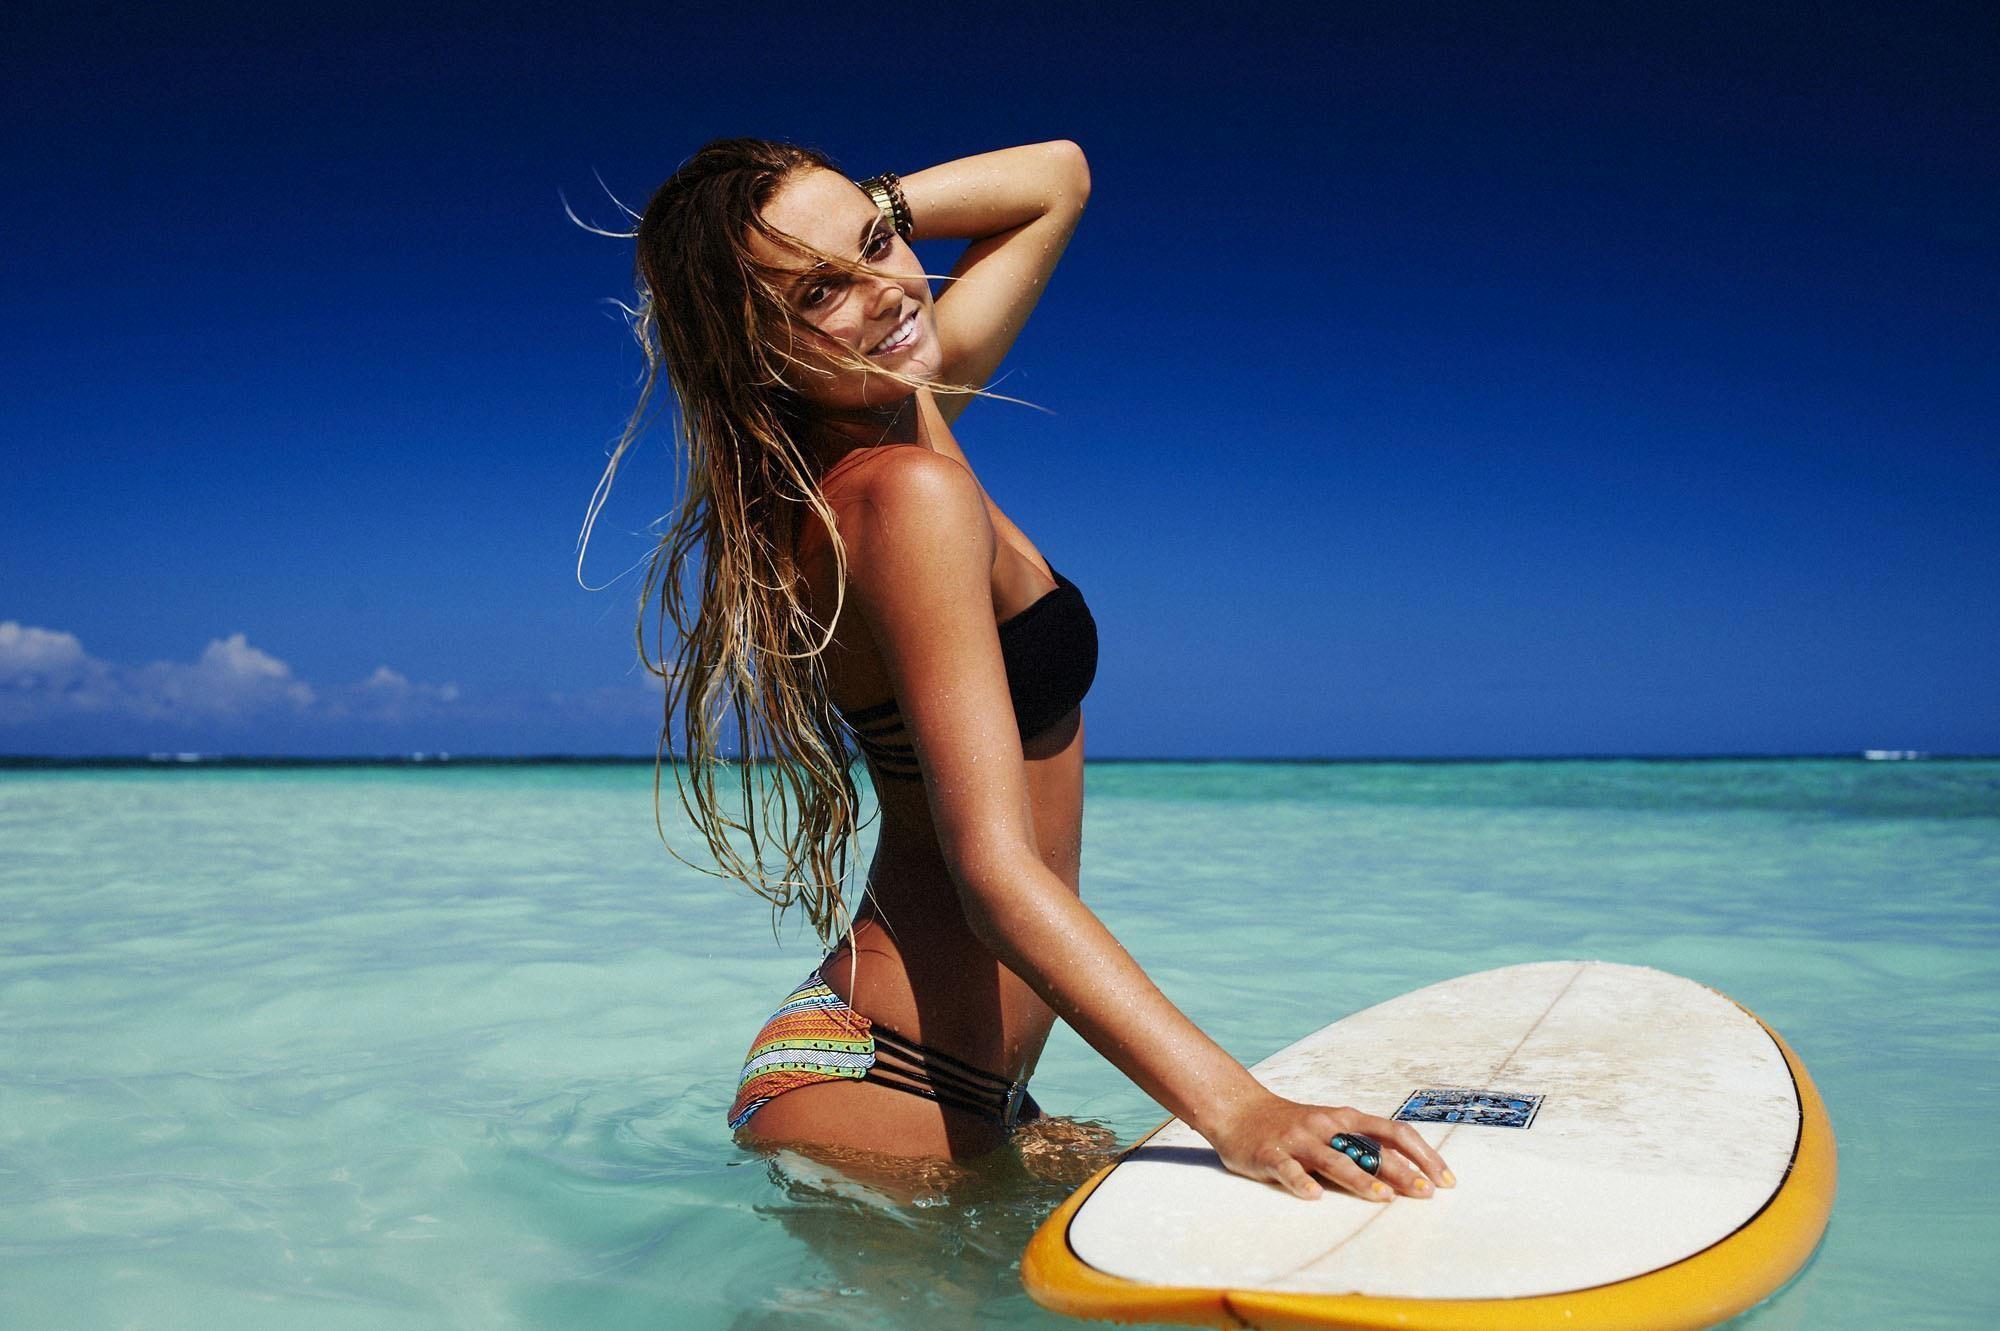 wallpaper.wiki-Hot-surfing-girl-wallpaper-HD-PIC-